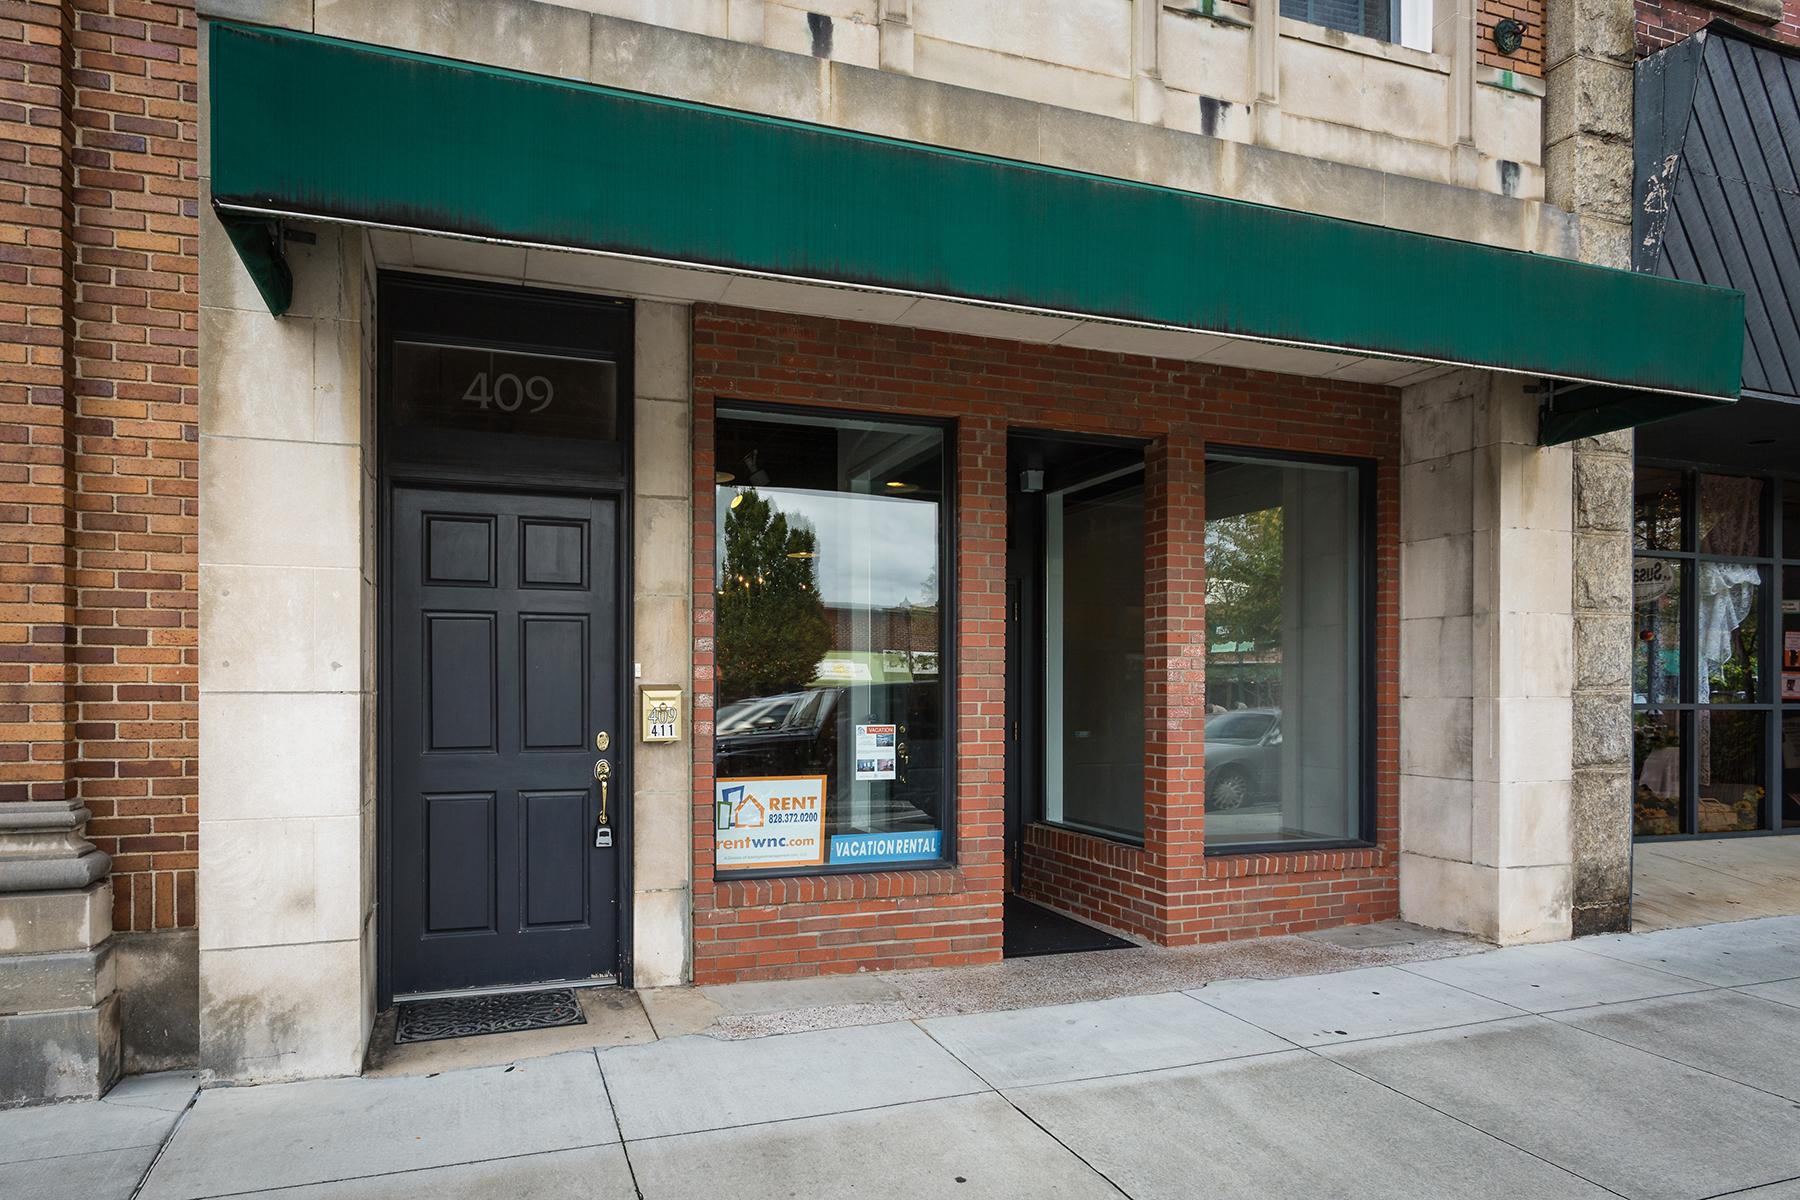 Condominium for Sale at HENDERSONVILLE 411 N Main St 409, Hendersonville, North Carolina 28792 United States